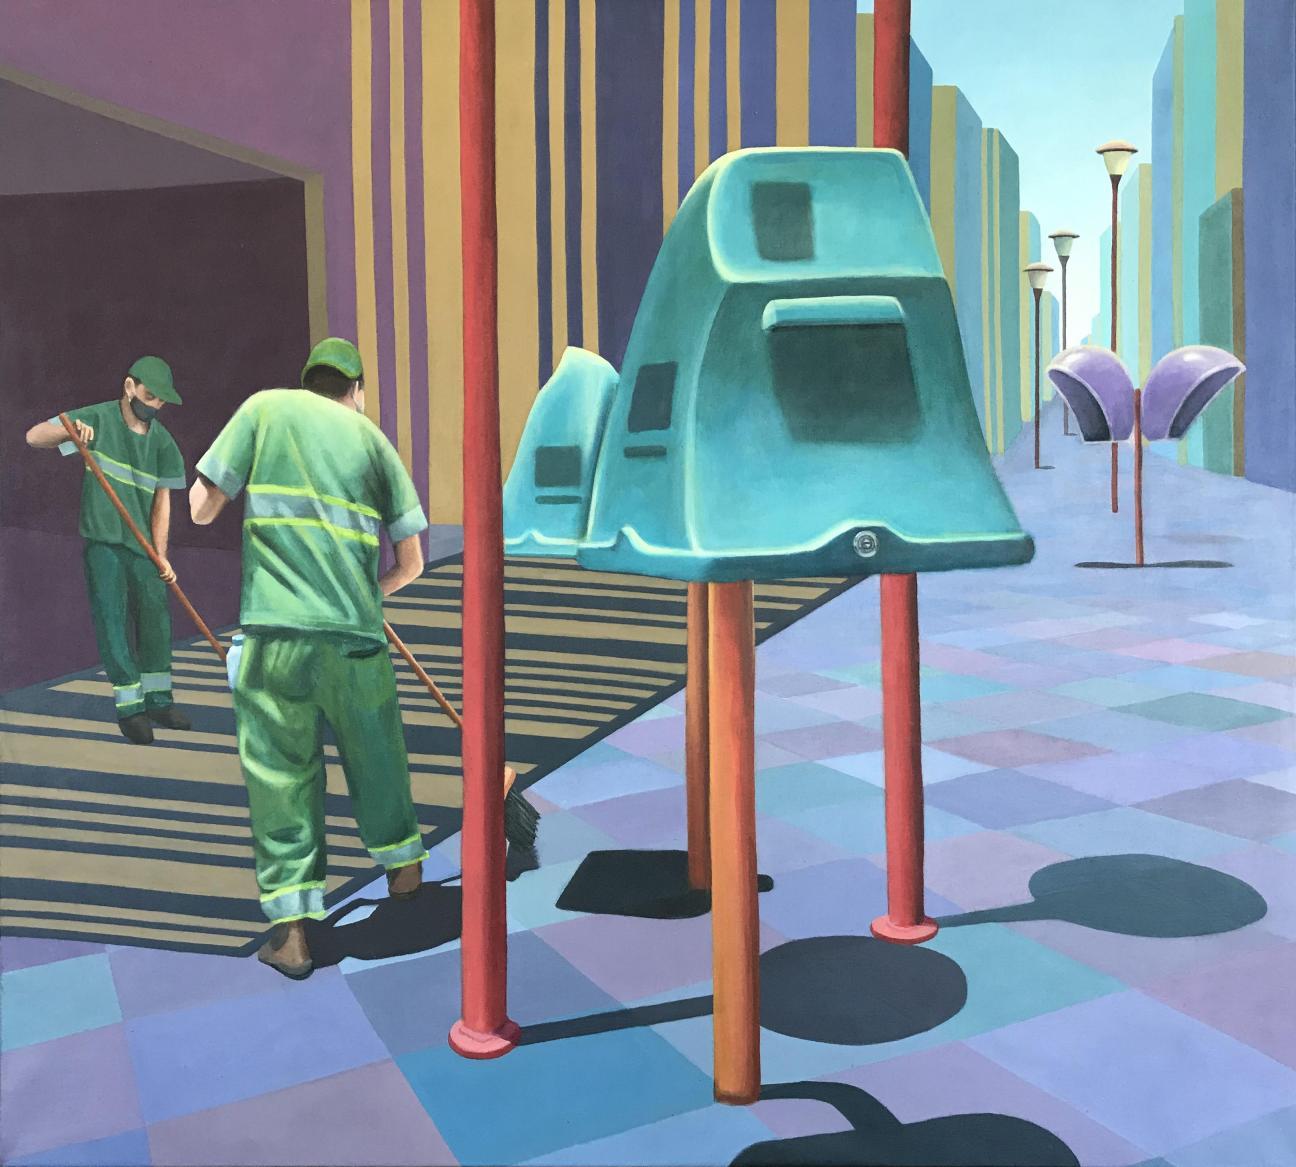 Aislamiento social (2020) - Michele Martines